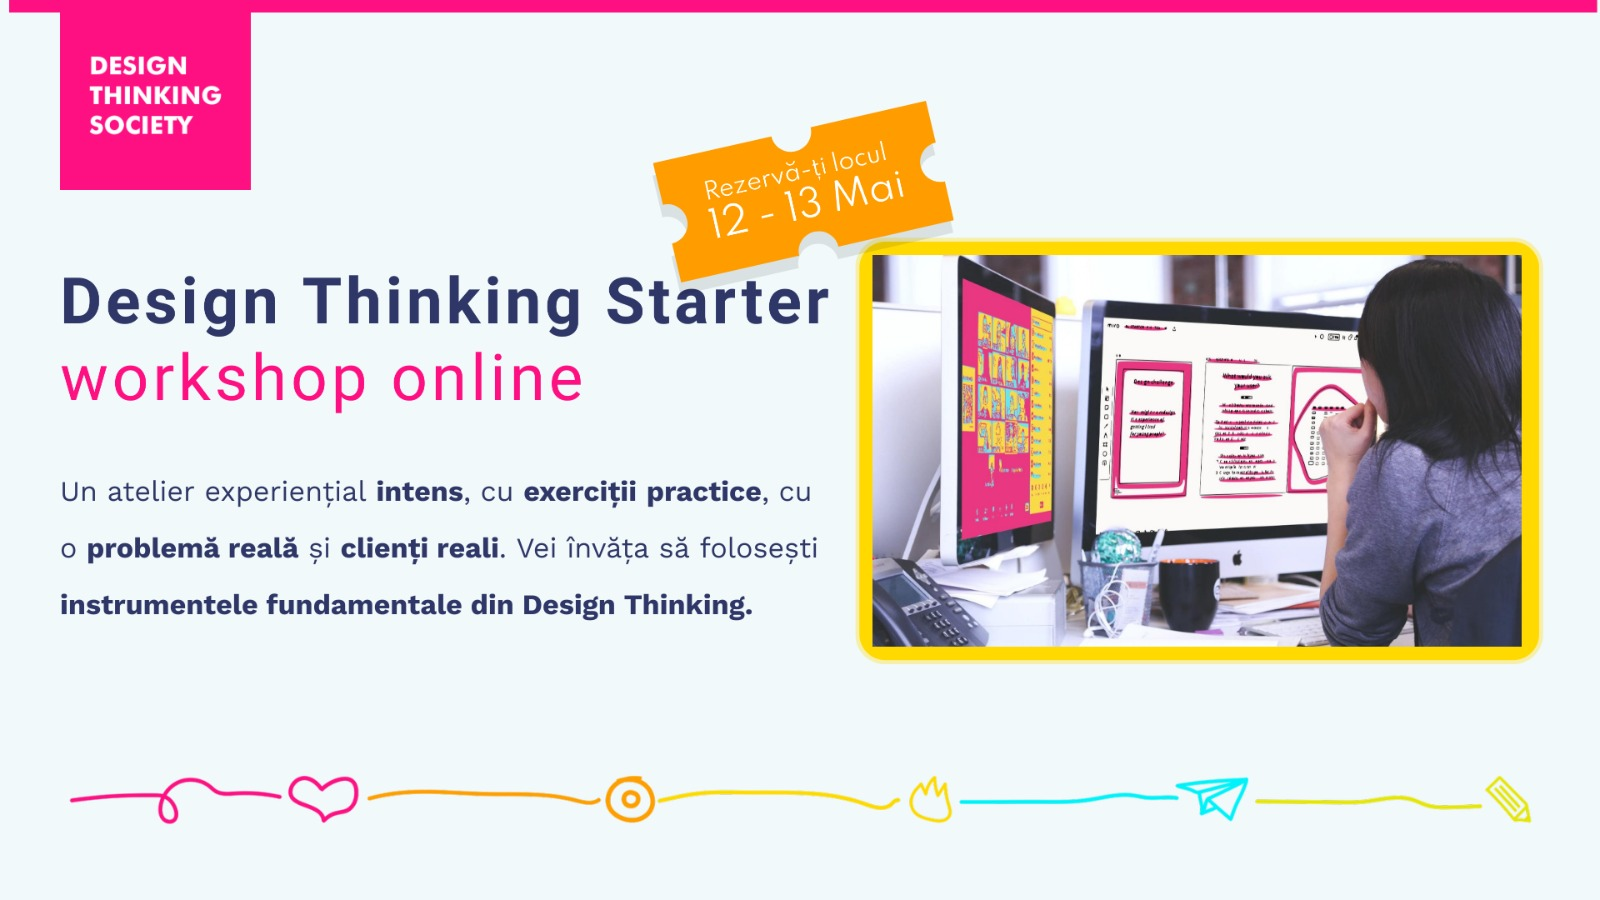 Design Thinking Starter